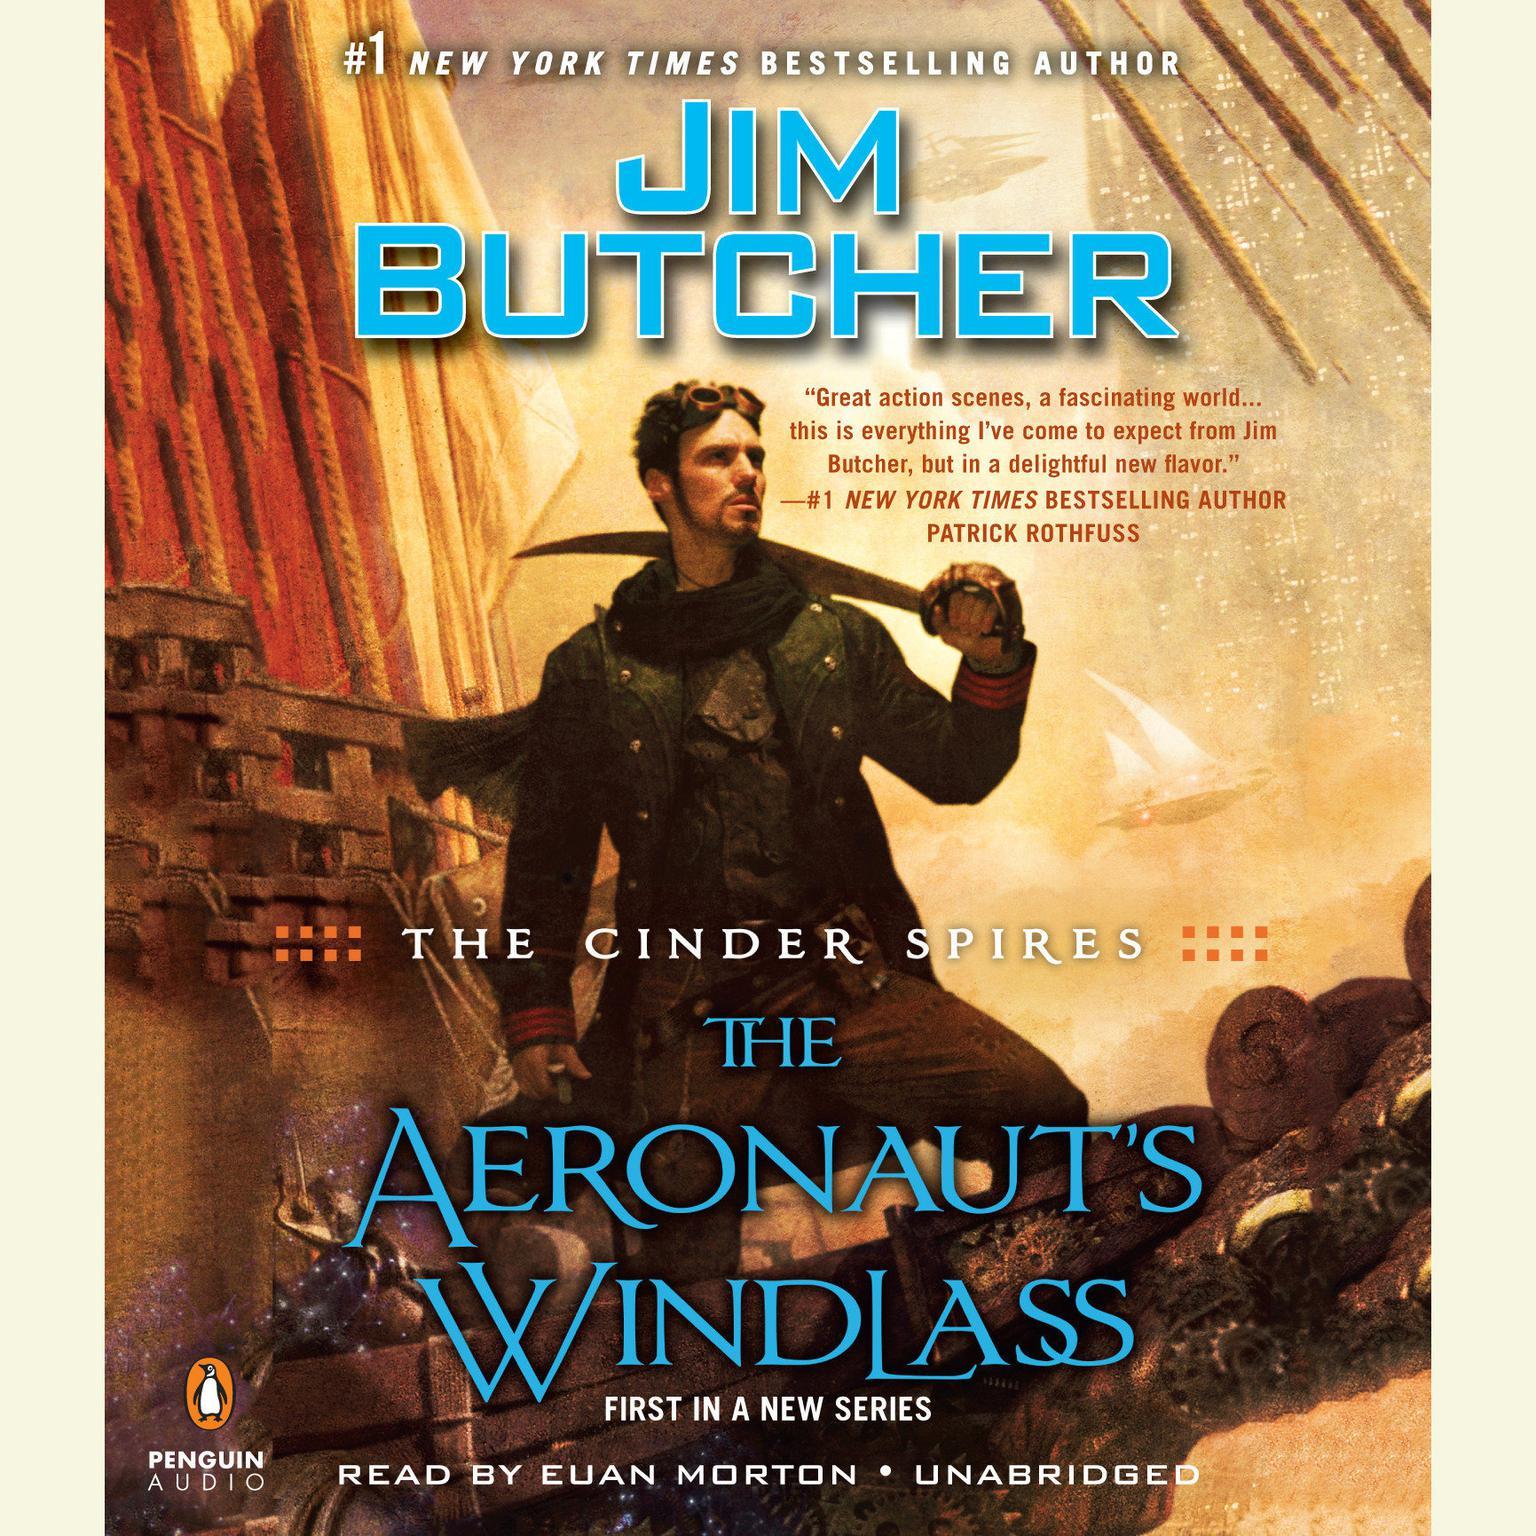 Printable The Cinder Spires: The Aeronaut's Windlass Audiobook Cover Art